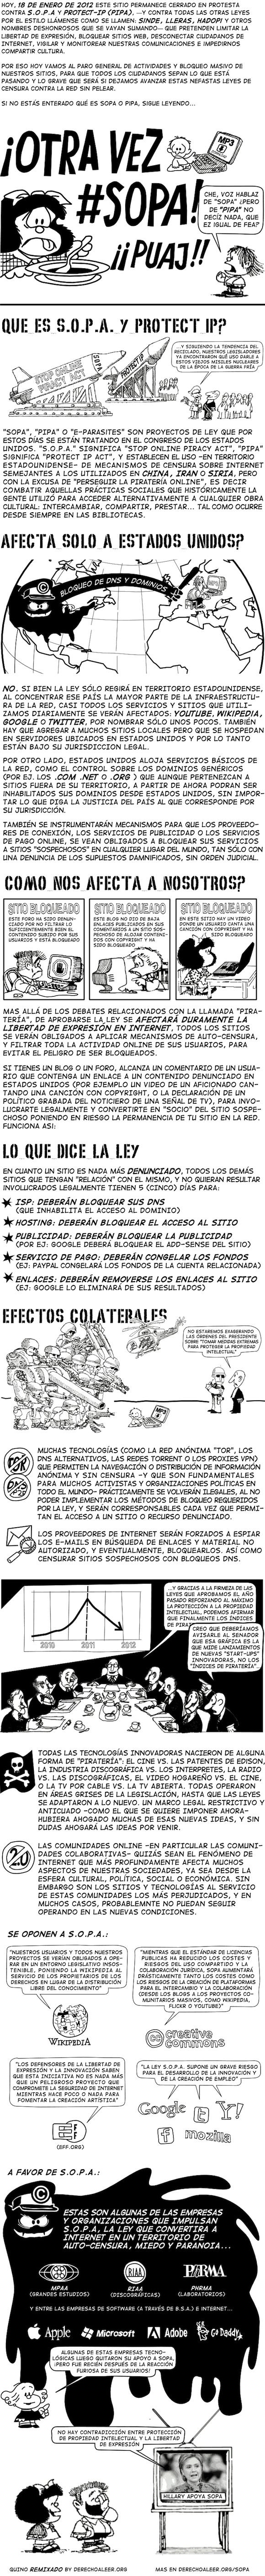 infografia ley sopa, ley pipa